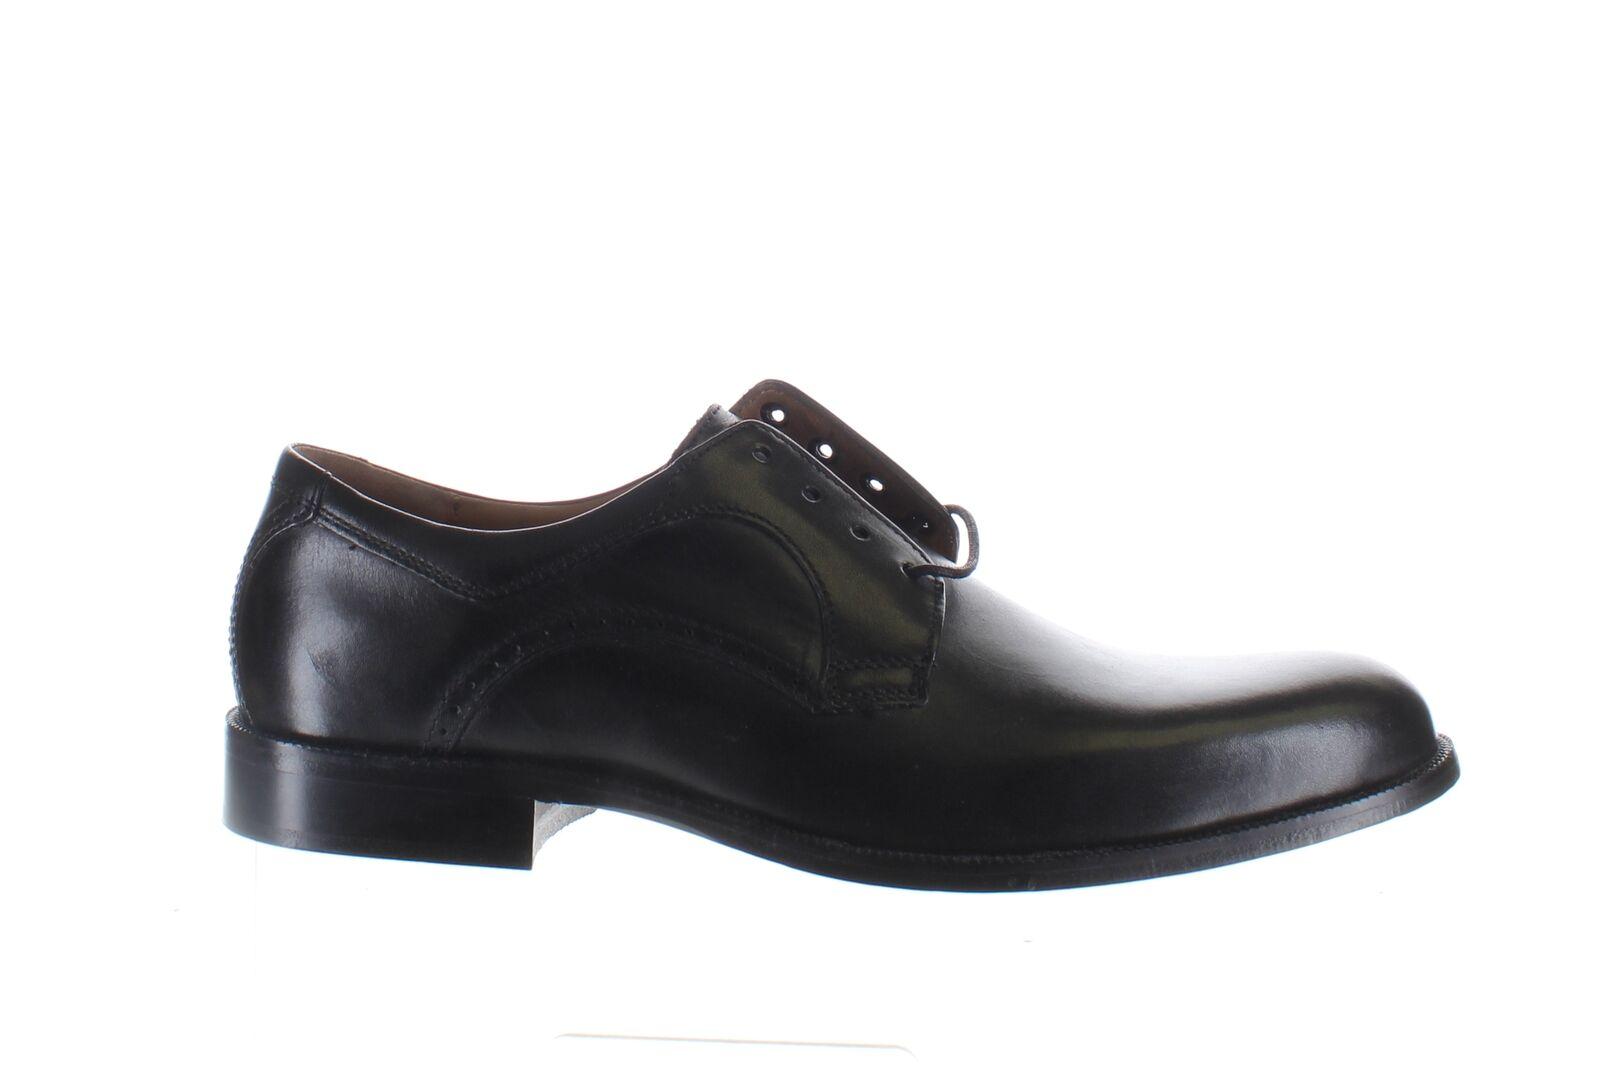 Johnston & Murphy Mens Harmon Black Oxford Dress Shoe Size 9.5 (2146371)